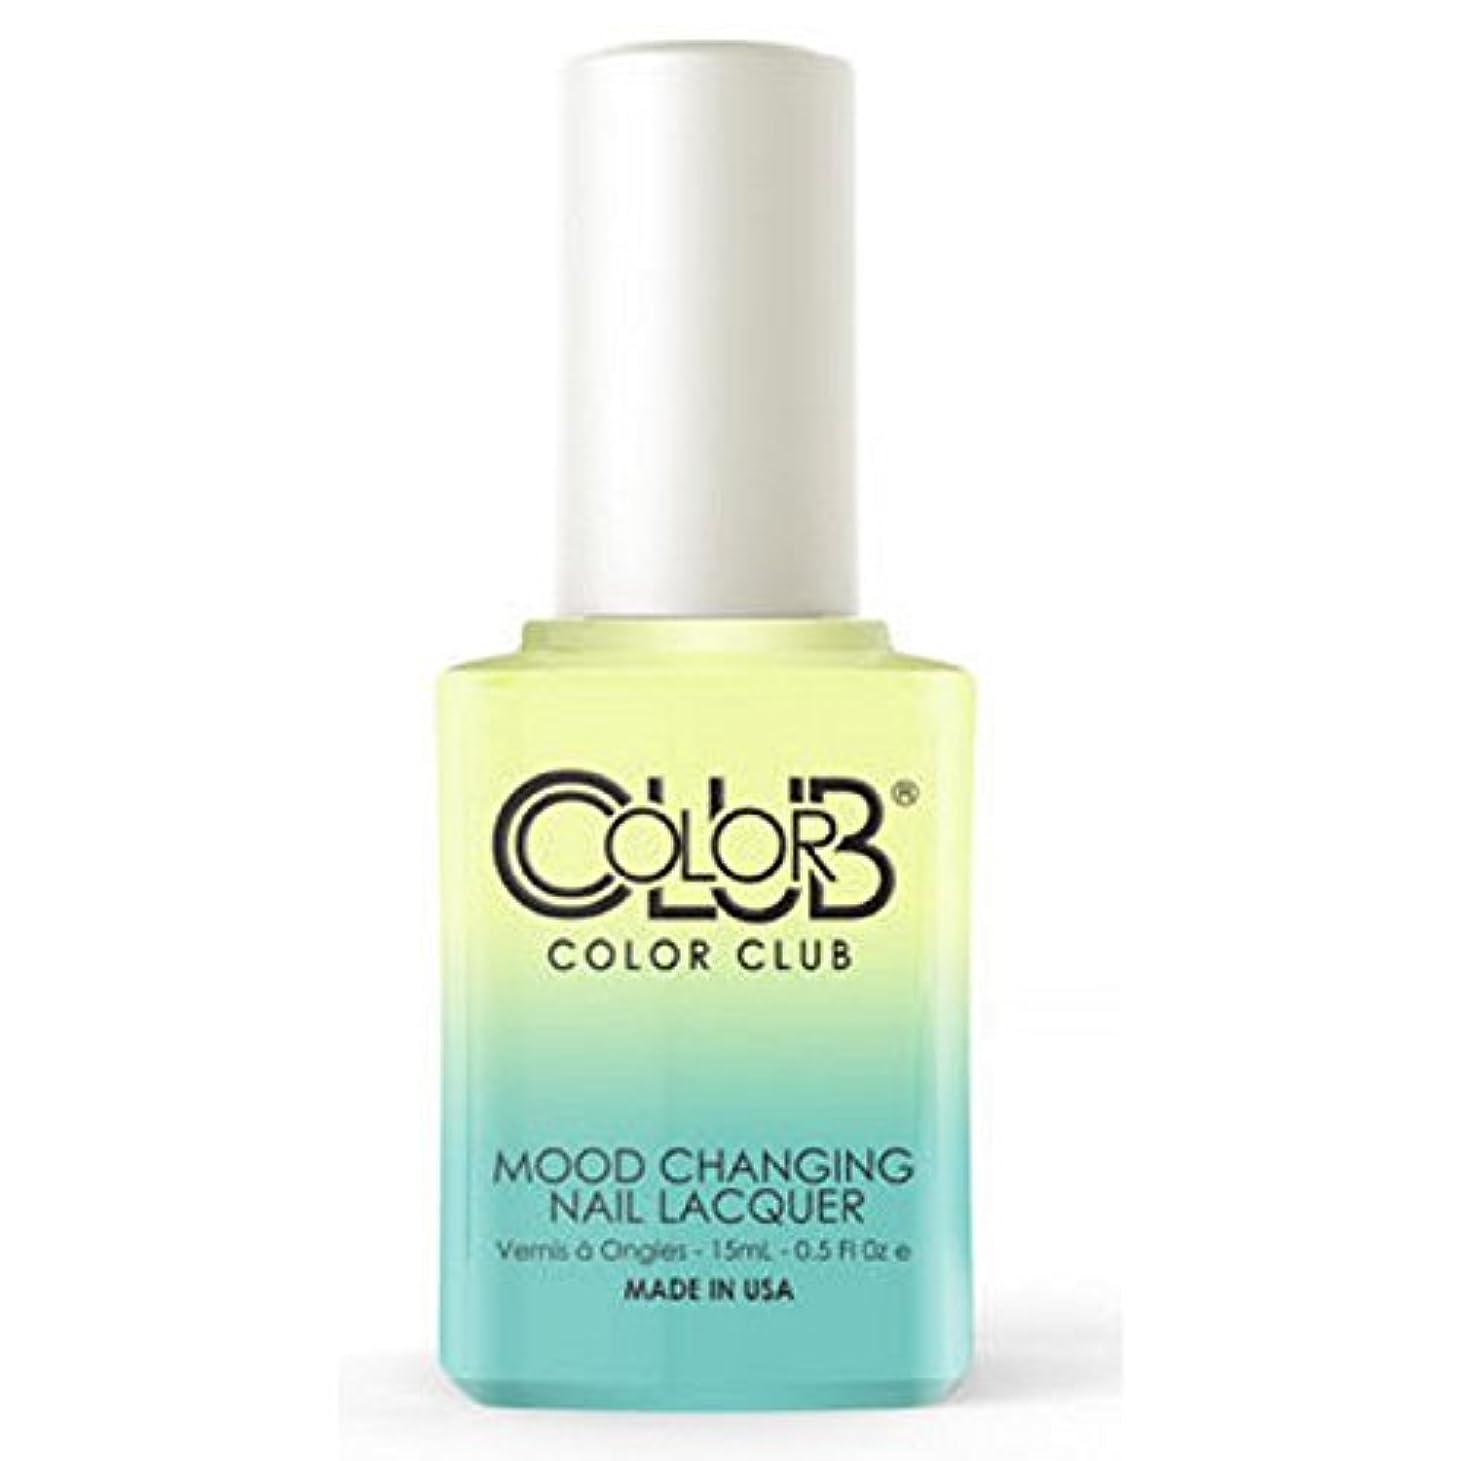 Color Club Mood Changing Nail Lacquer - Shine Theory - 15 mL / 0.5 fl oz